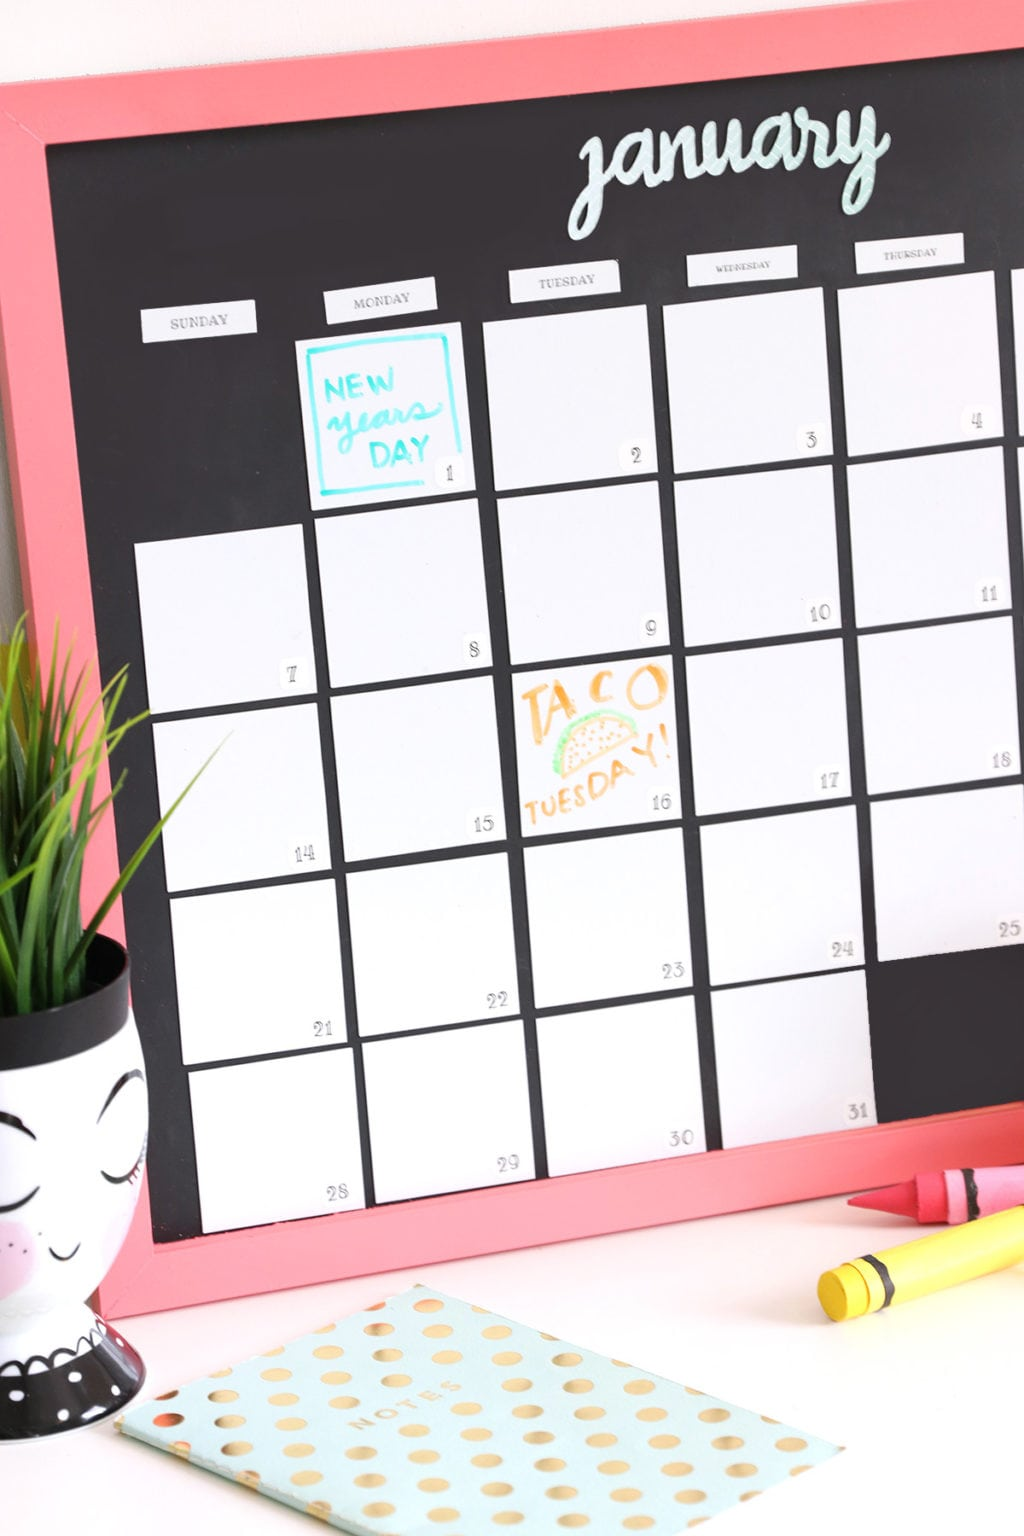 Diy Magnetic Whiteboard Calendar With Dymo Mobilelabeler